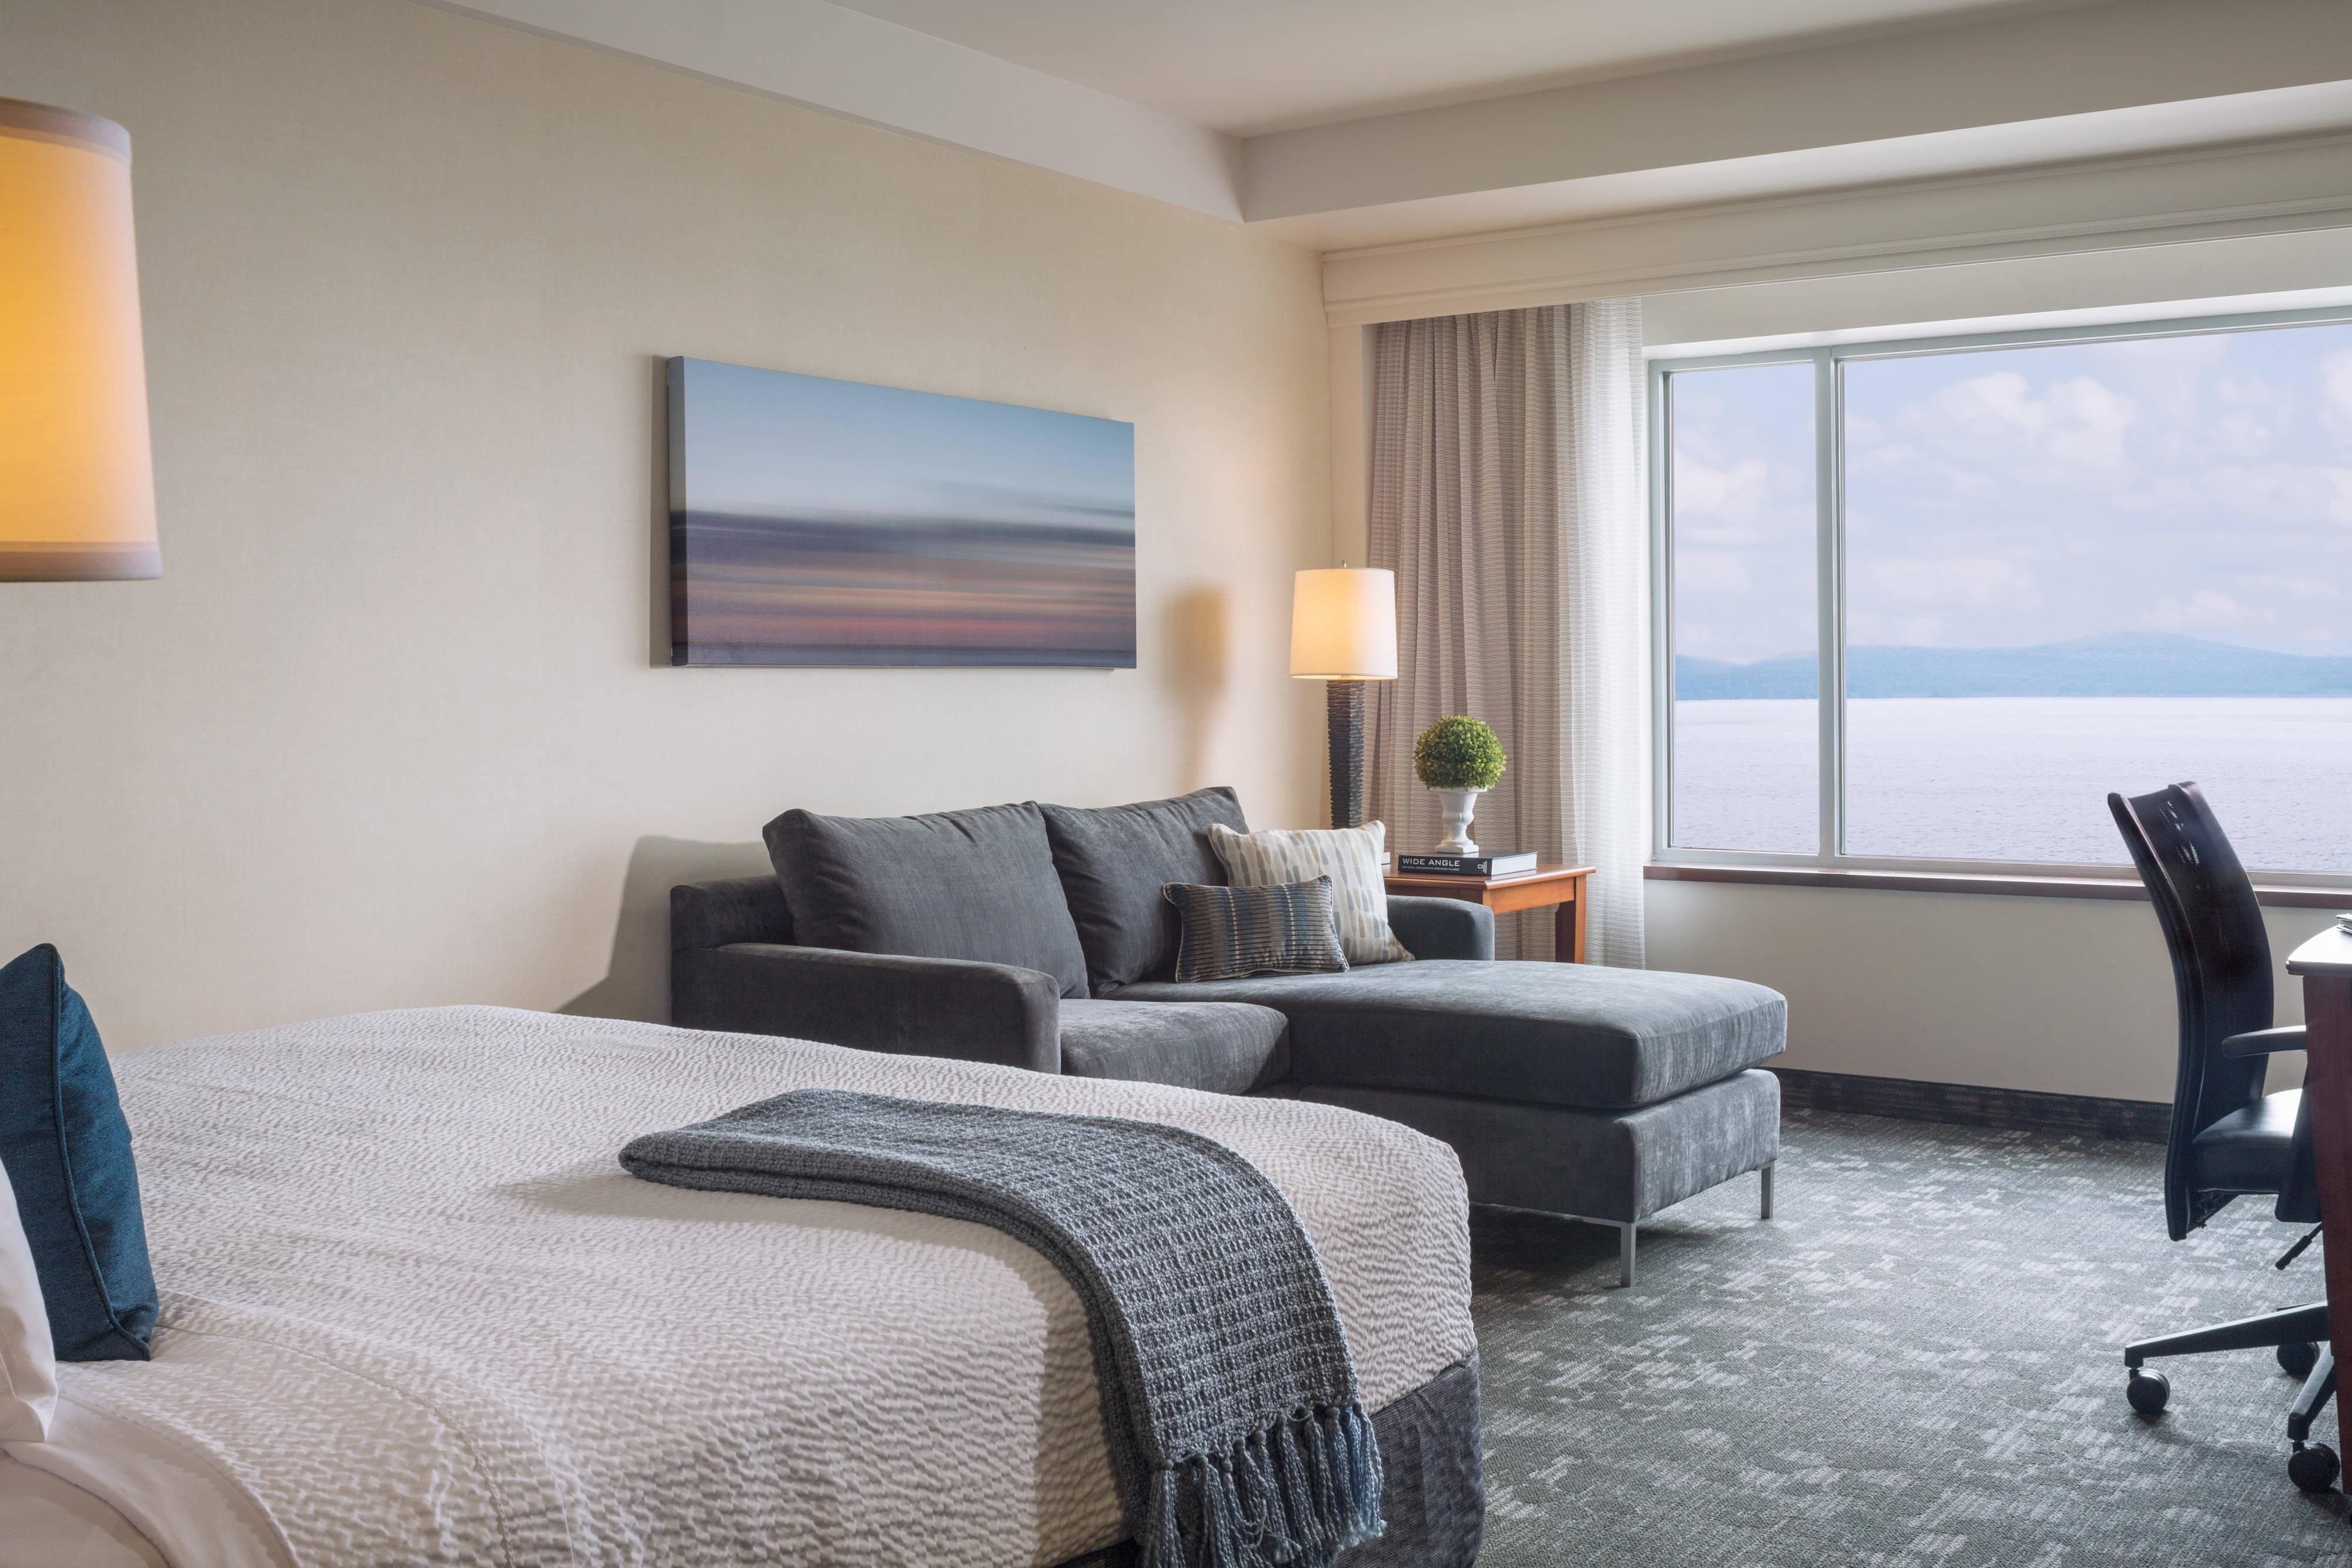 Burlington King Lake View Room